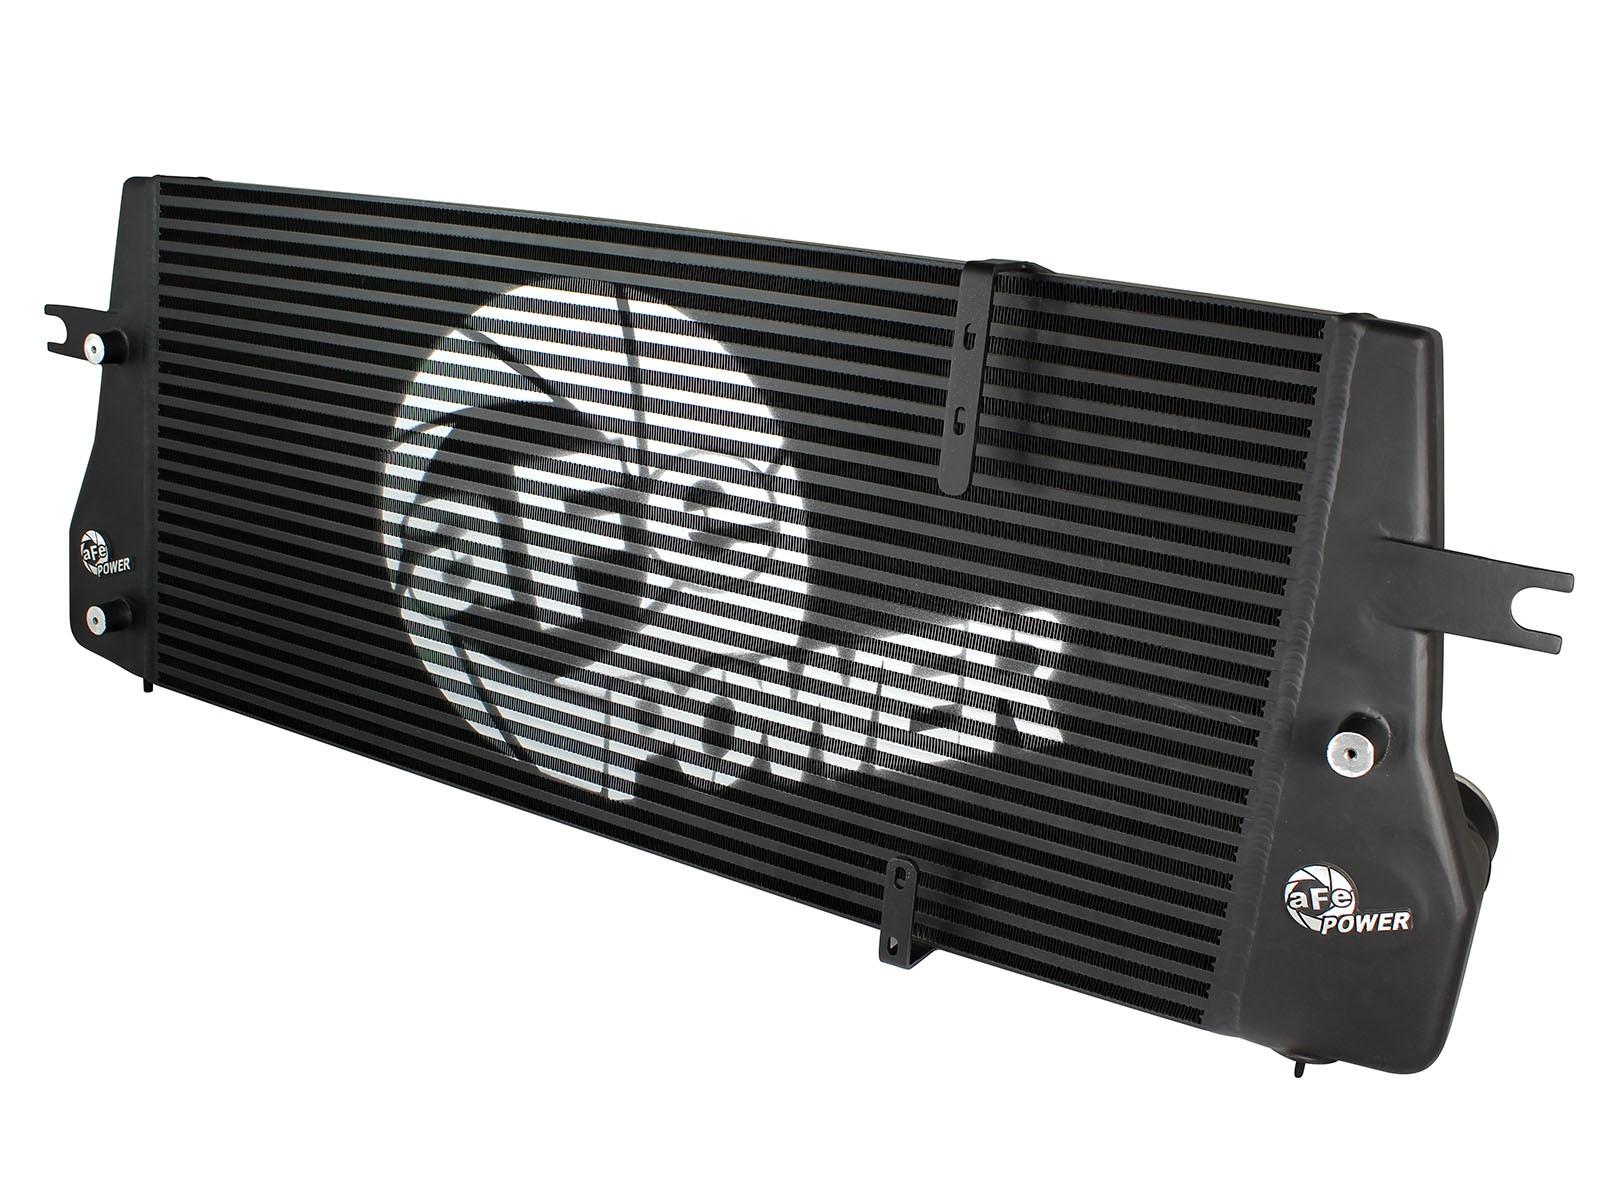 aFe POWER 46-21061 BladeRunner Street Series Cast Intercooler